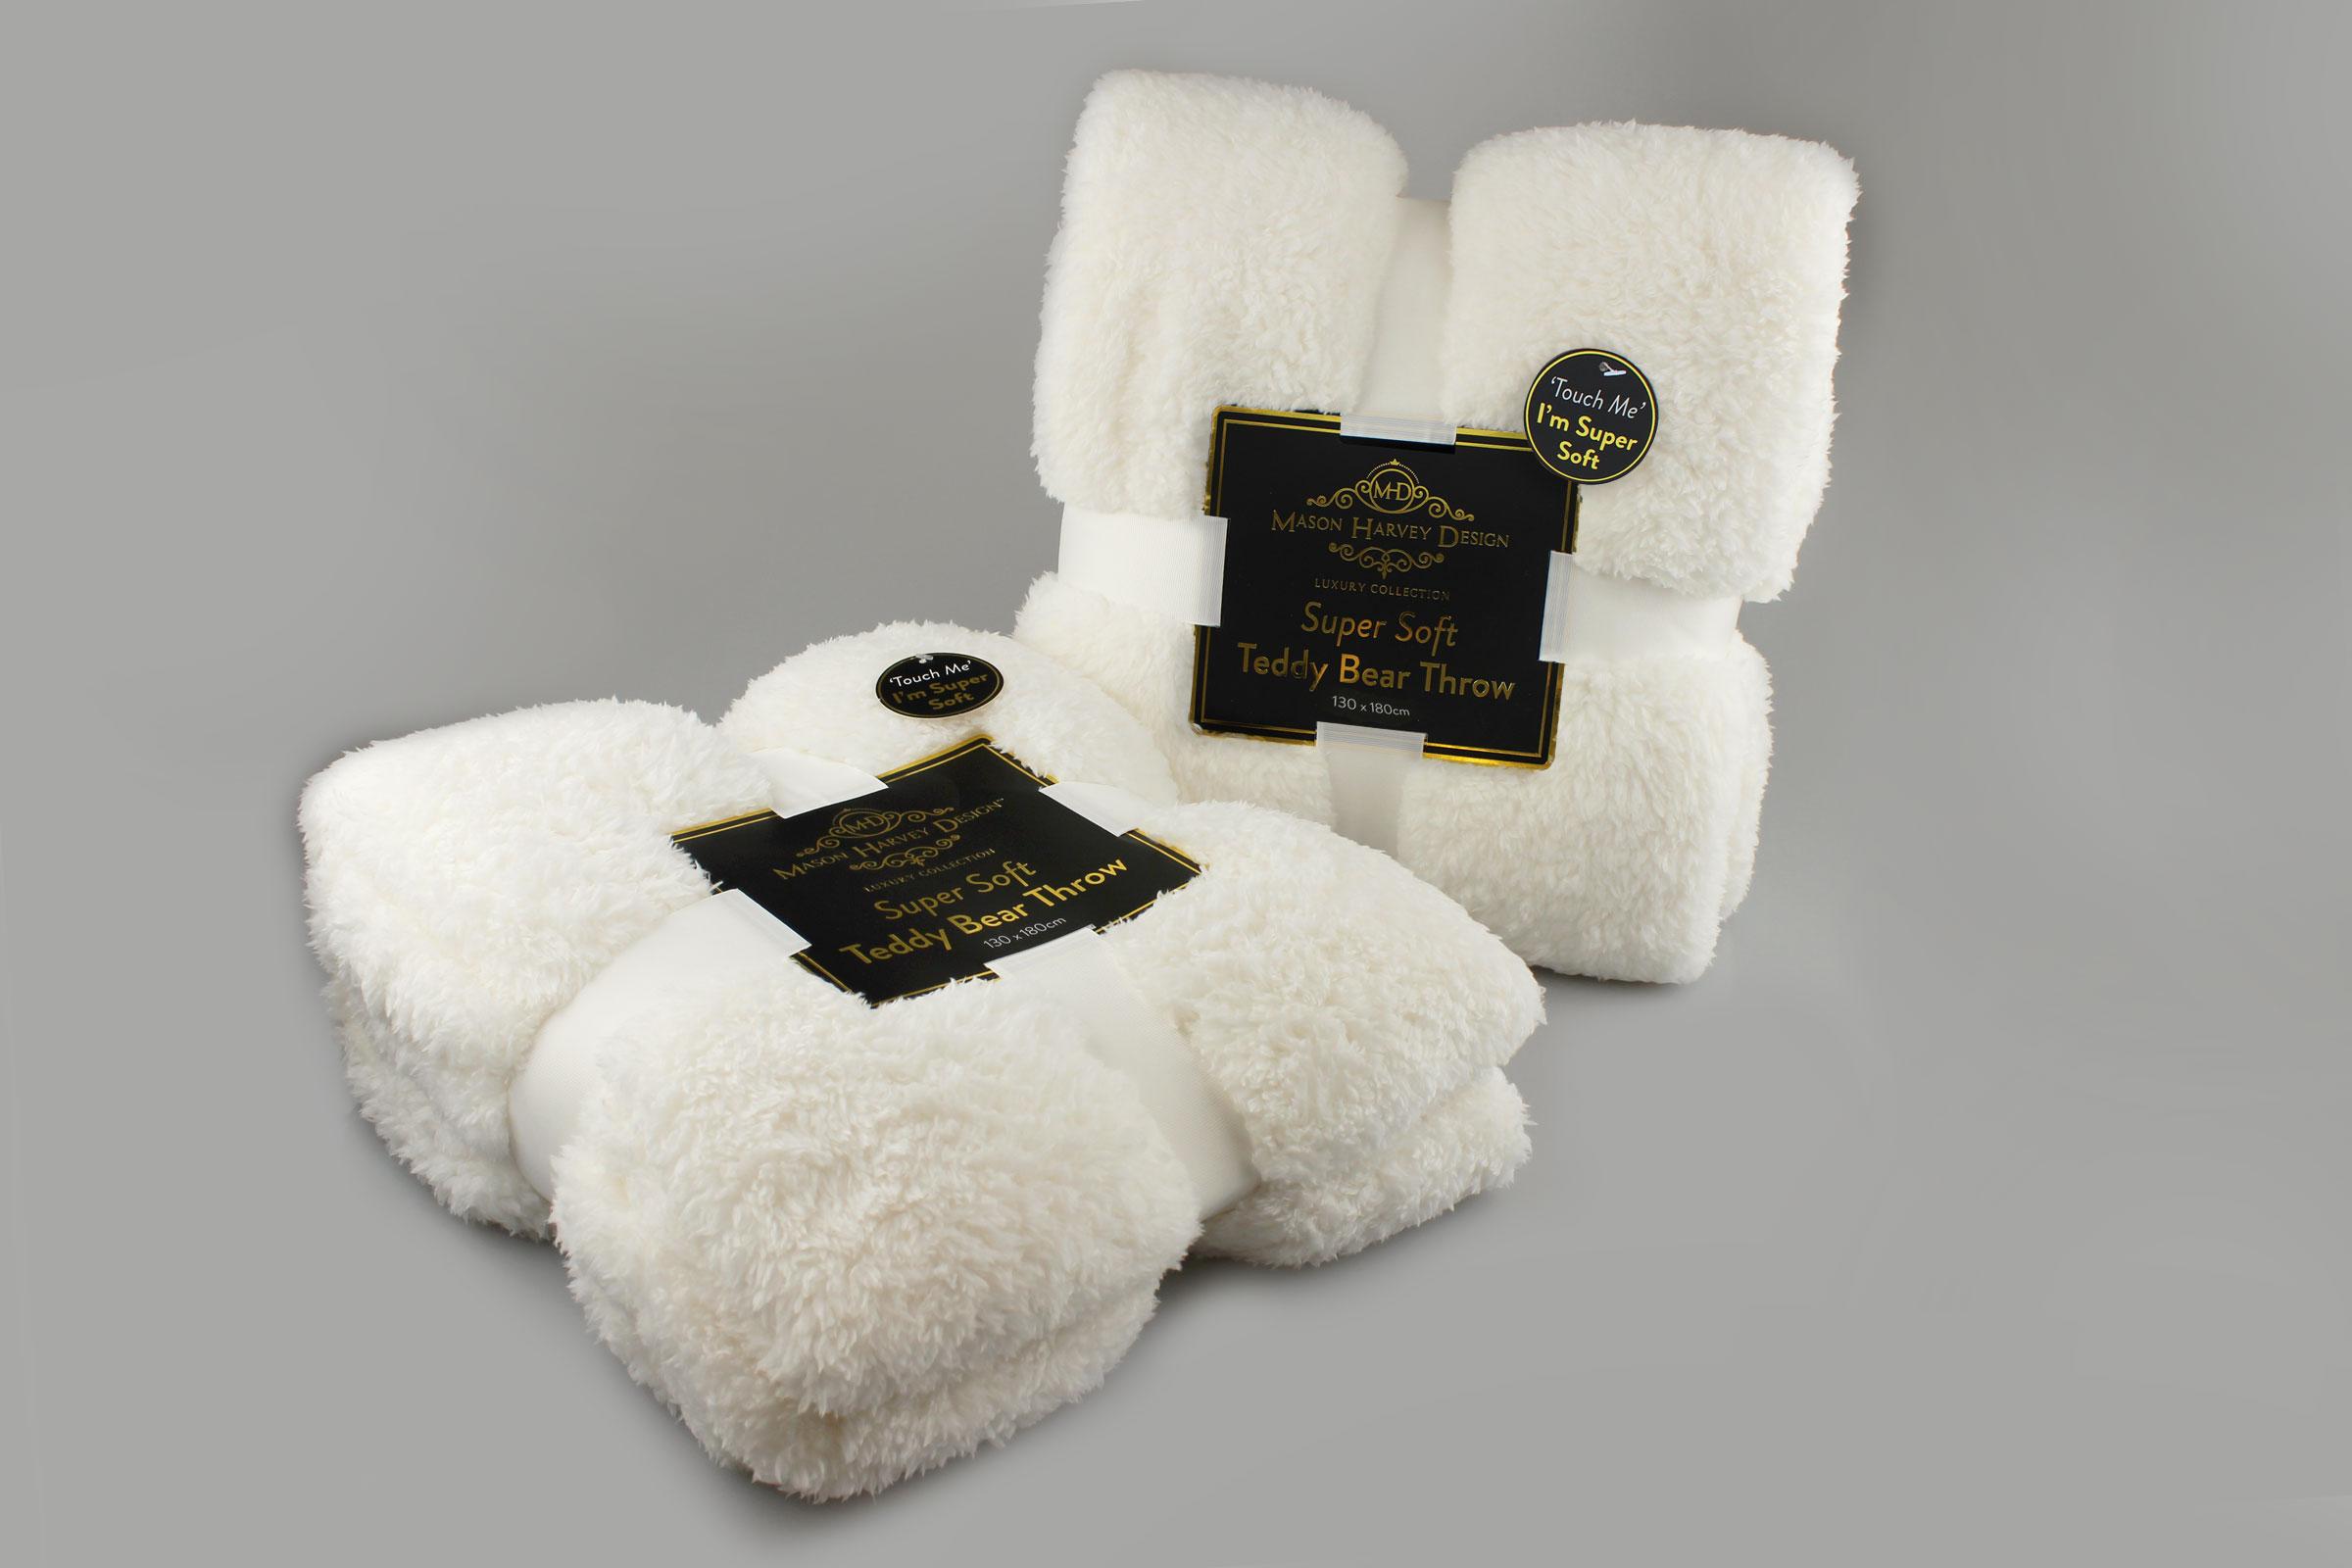 Teddy Bear Throw Sherpa Super Soft Couch Bed Comfy Snug